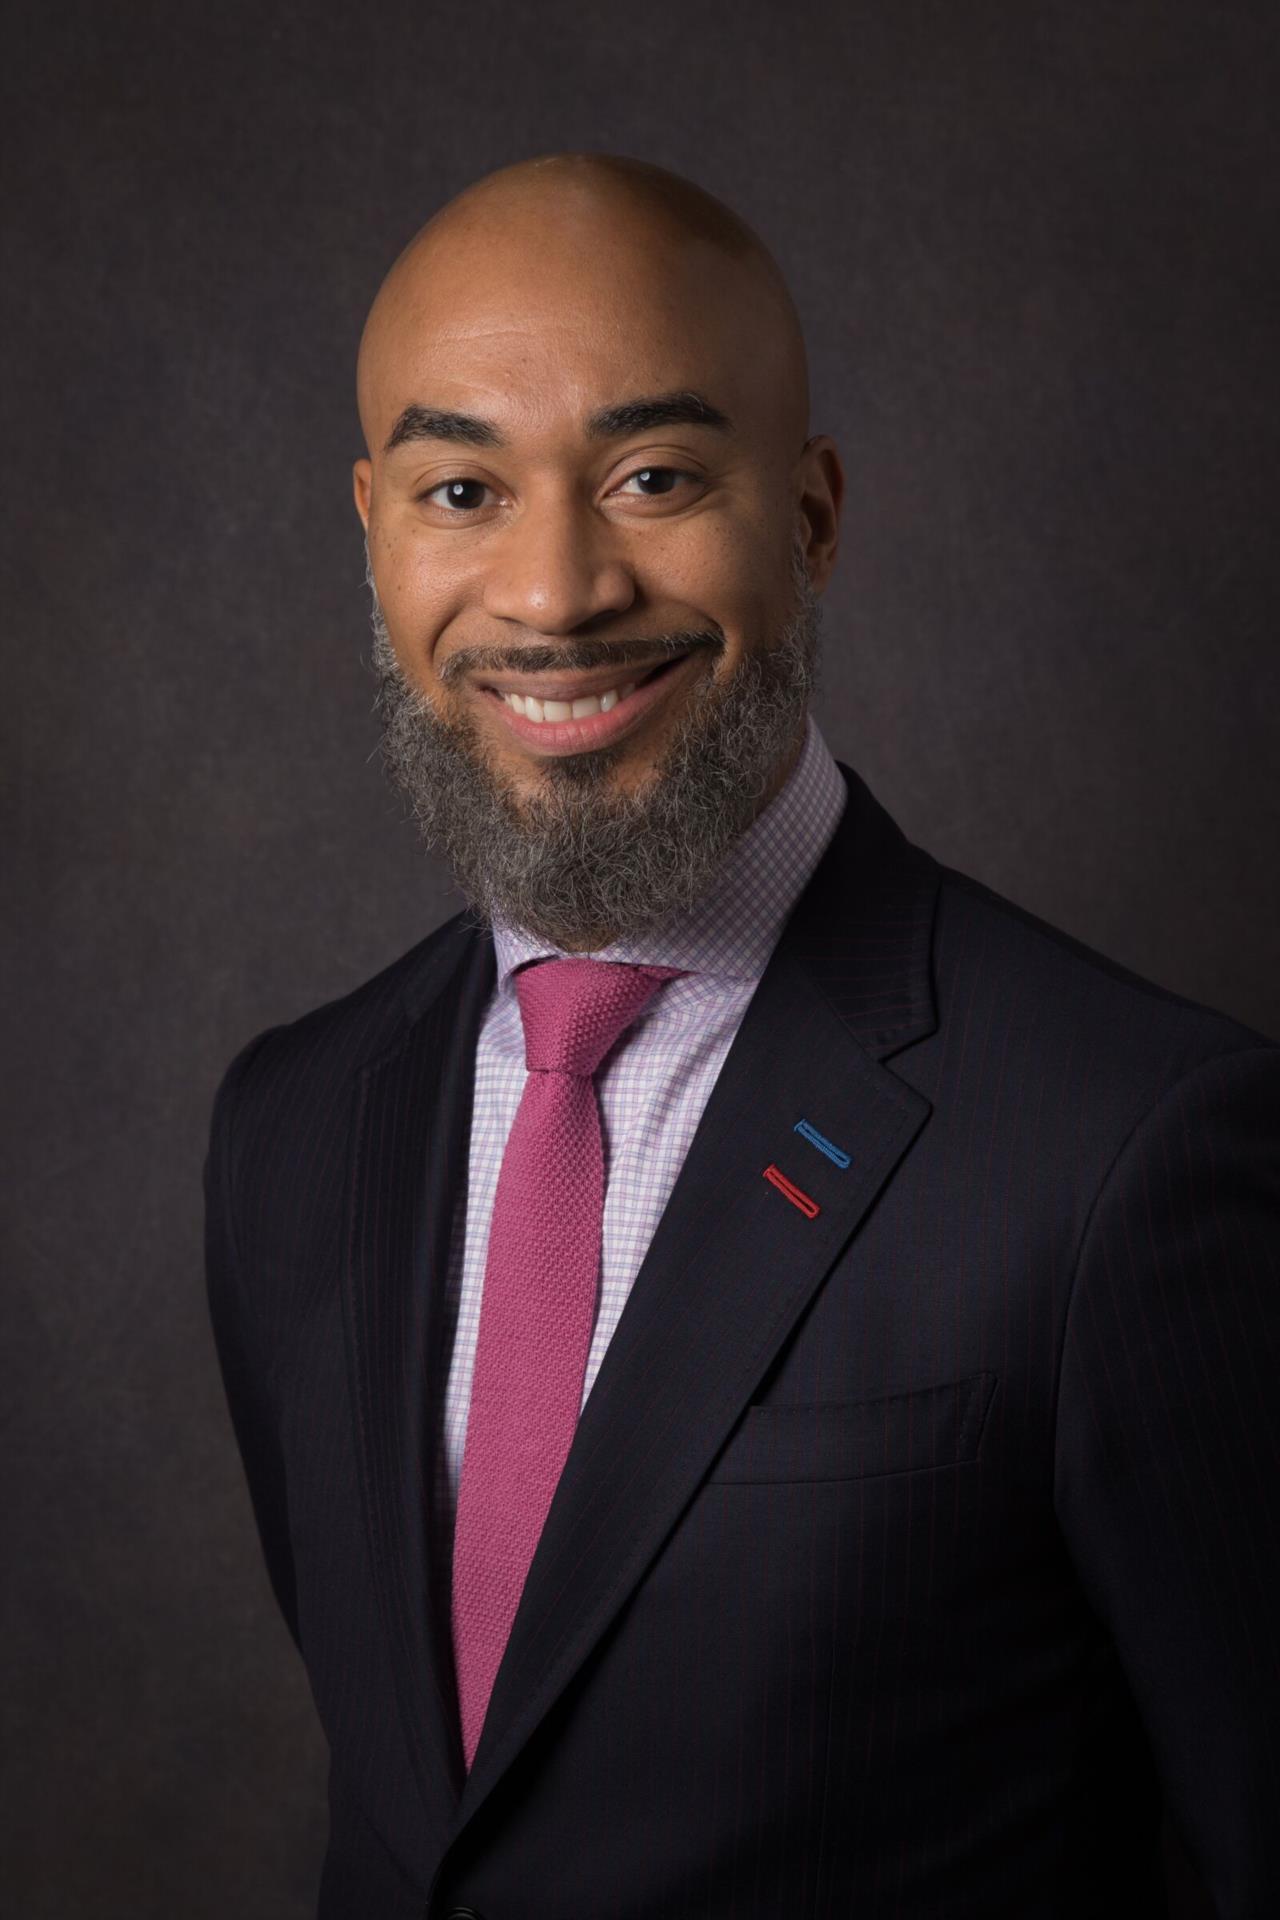 Superintendent Melvin J. Brown